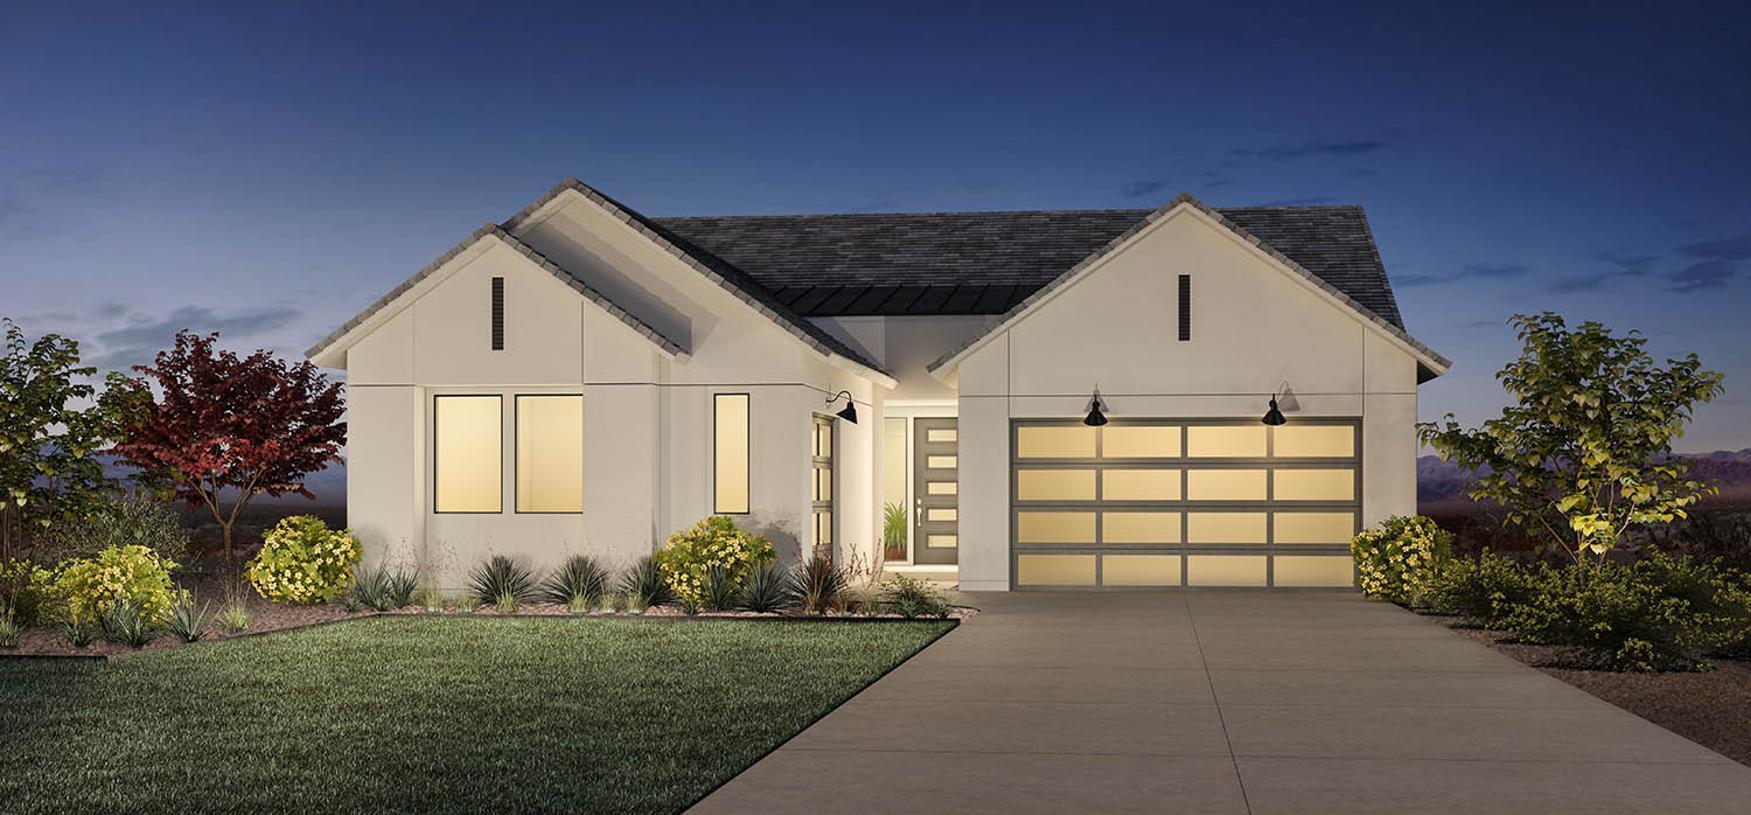 Elevation Image:The Contemporary Farmhouse